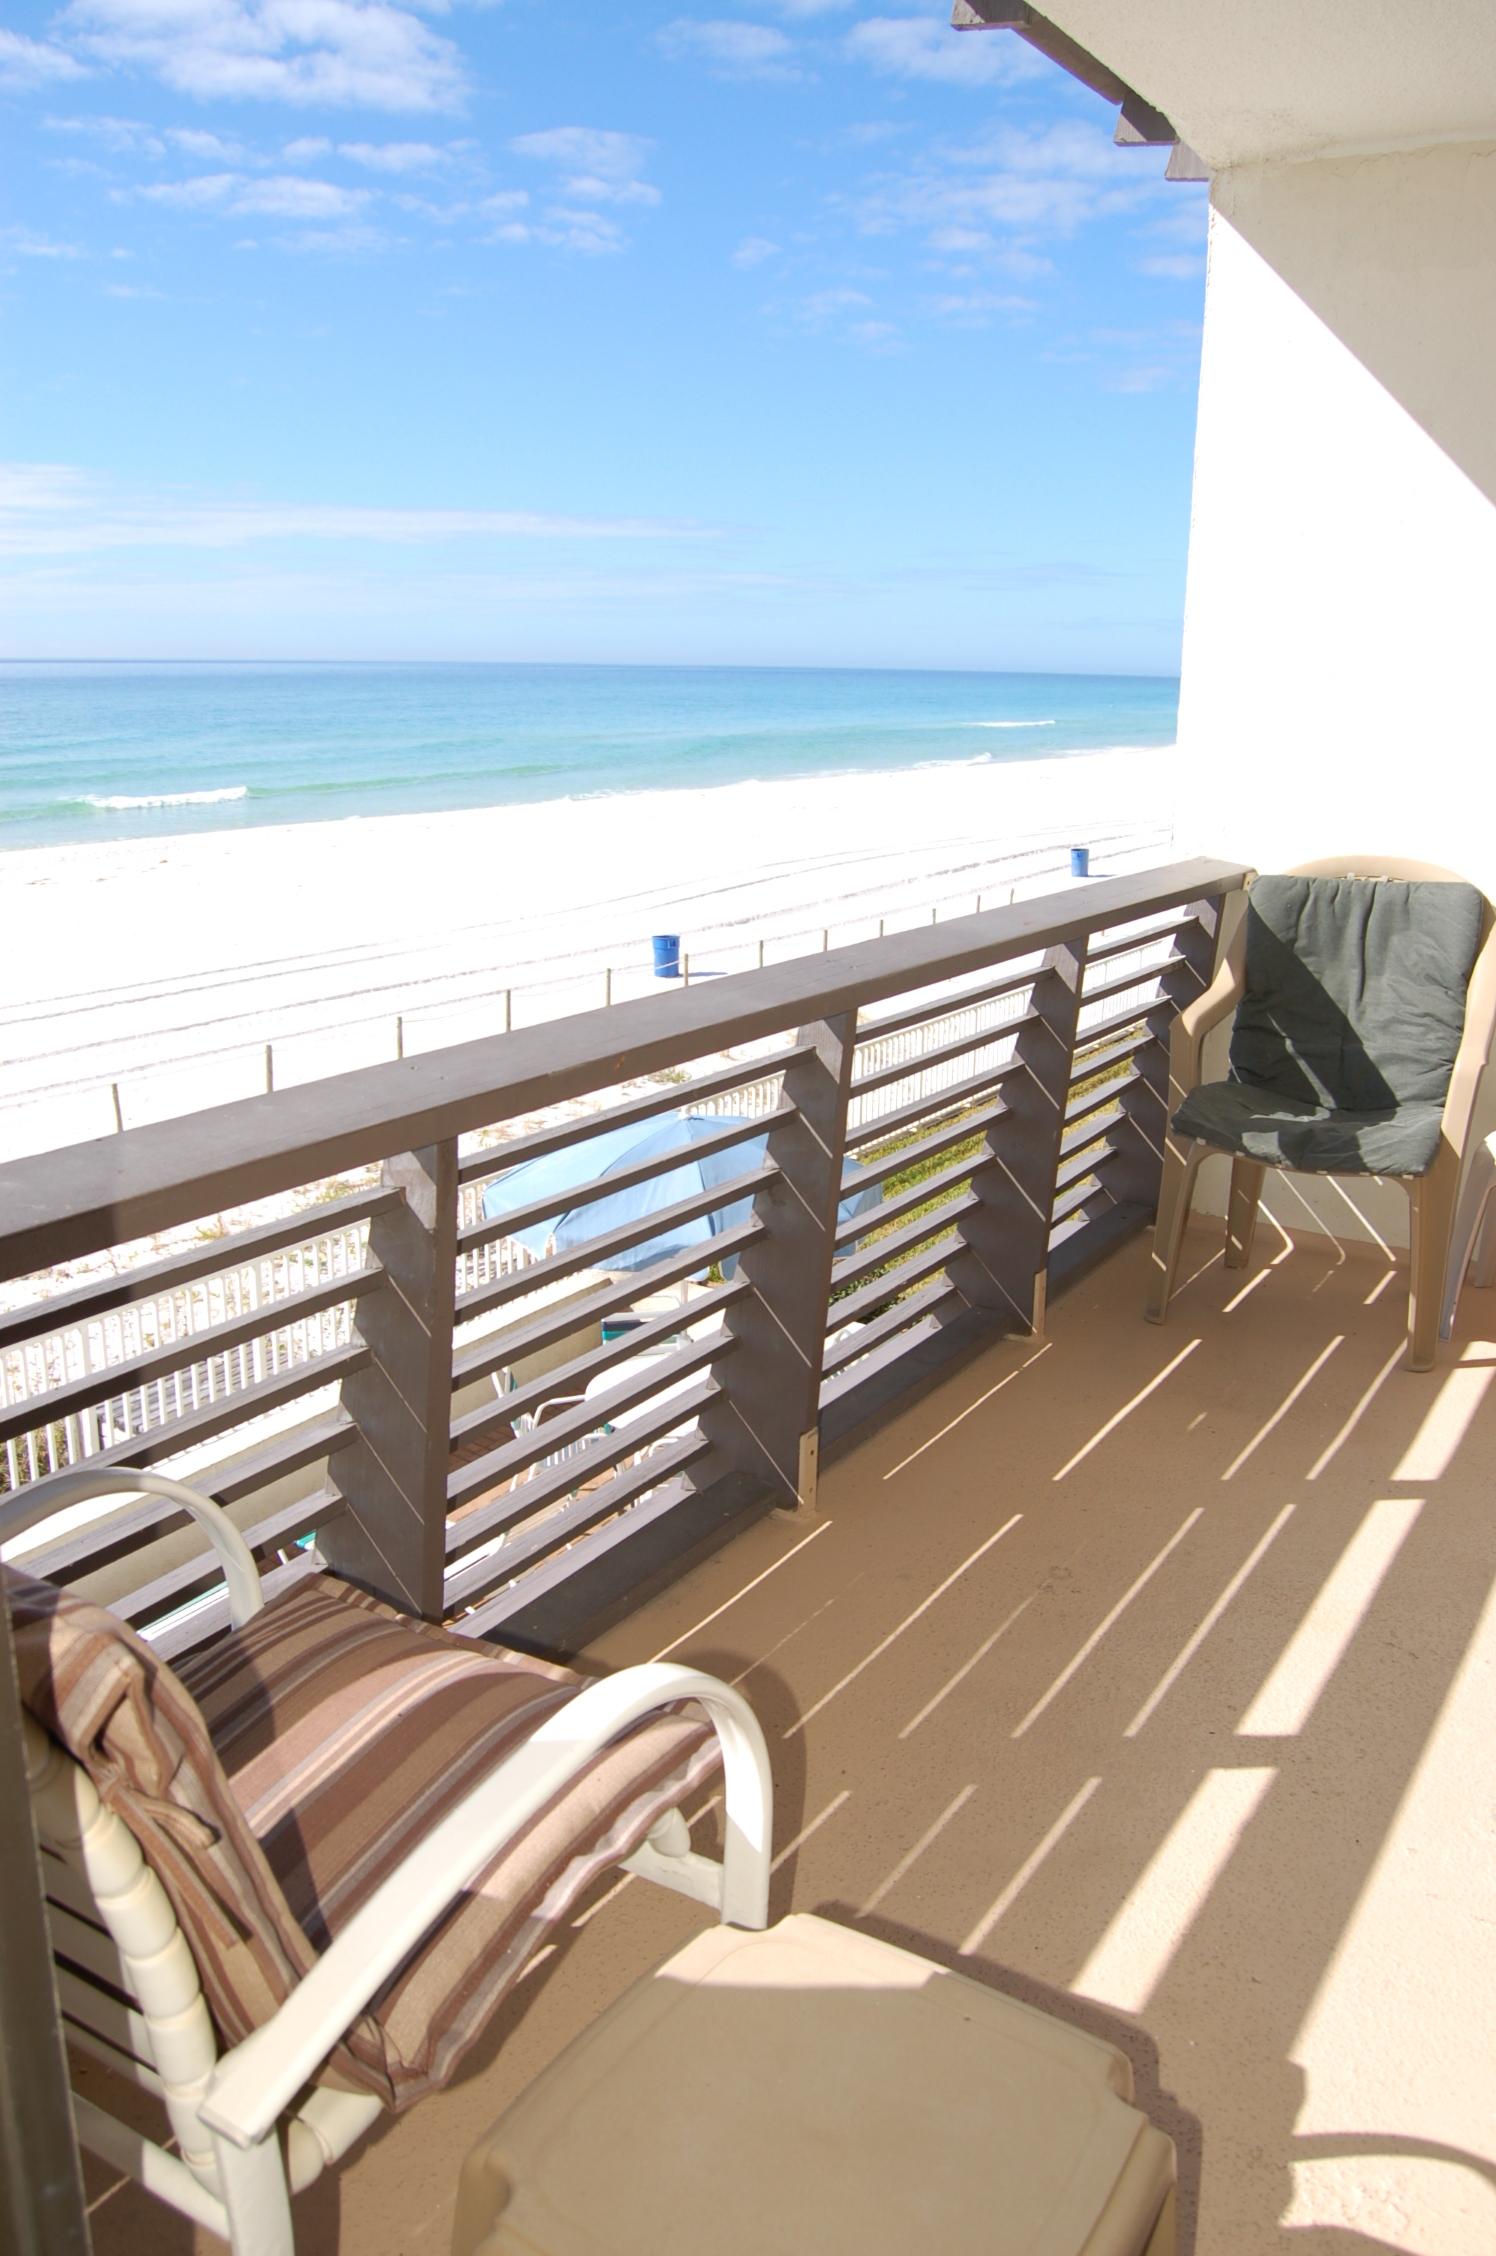 Gulf Gate Condos In Panama City Beach, FL Unit 206